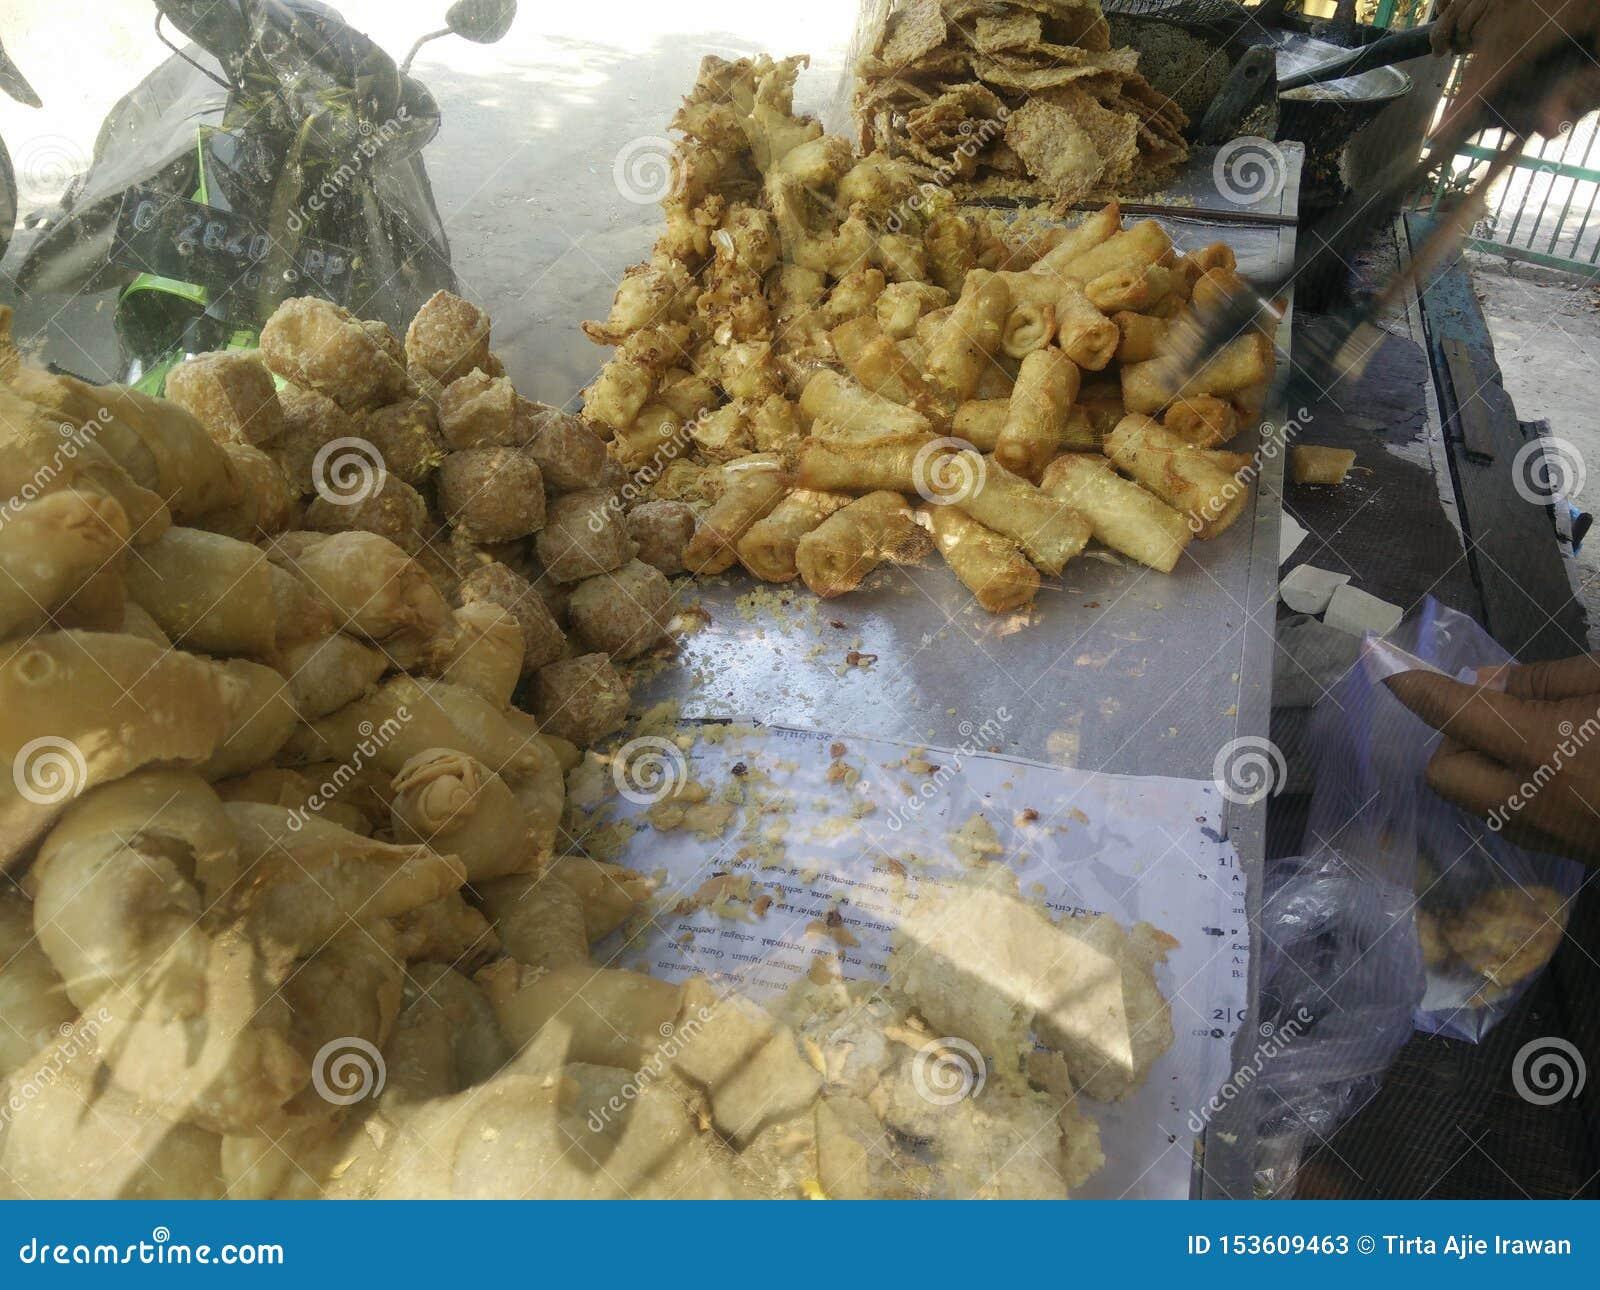 Bekasi Indonesia July 10 2019 Gorengan : Fried food is one type of popular snack in indonesia, fried tempeh, tofu banana